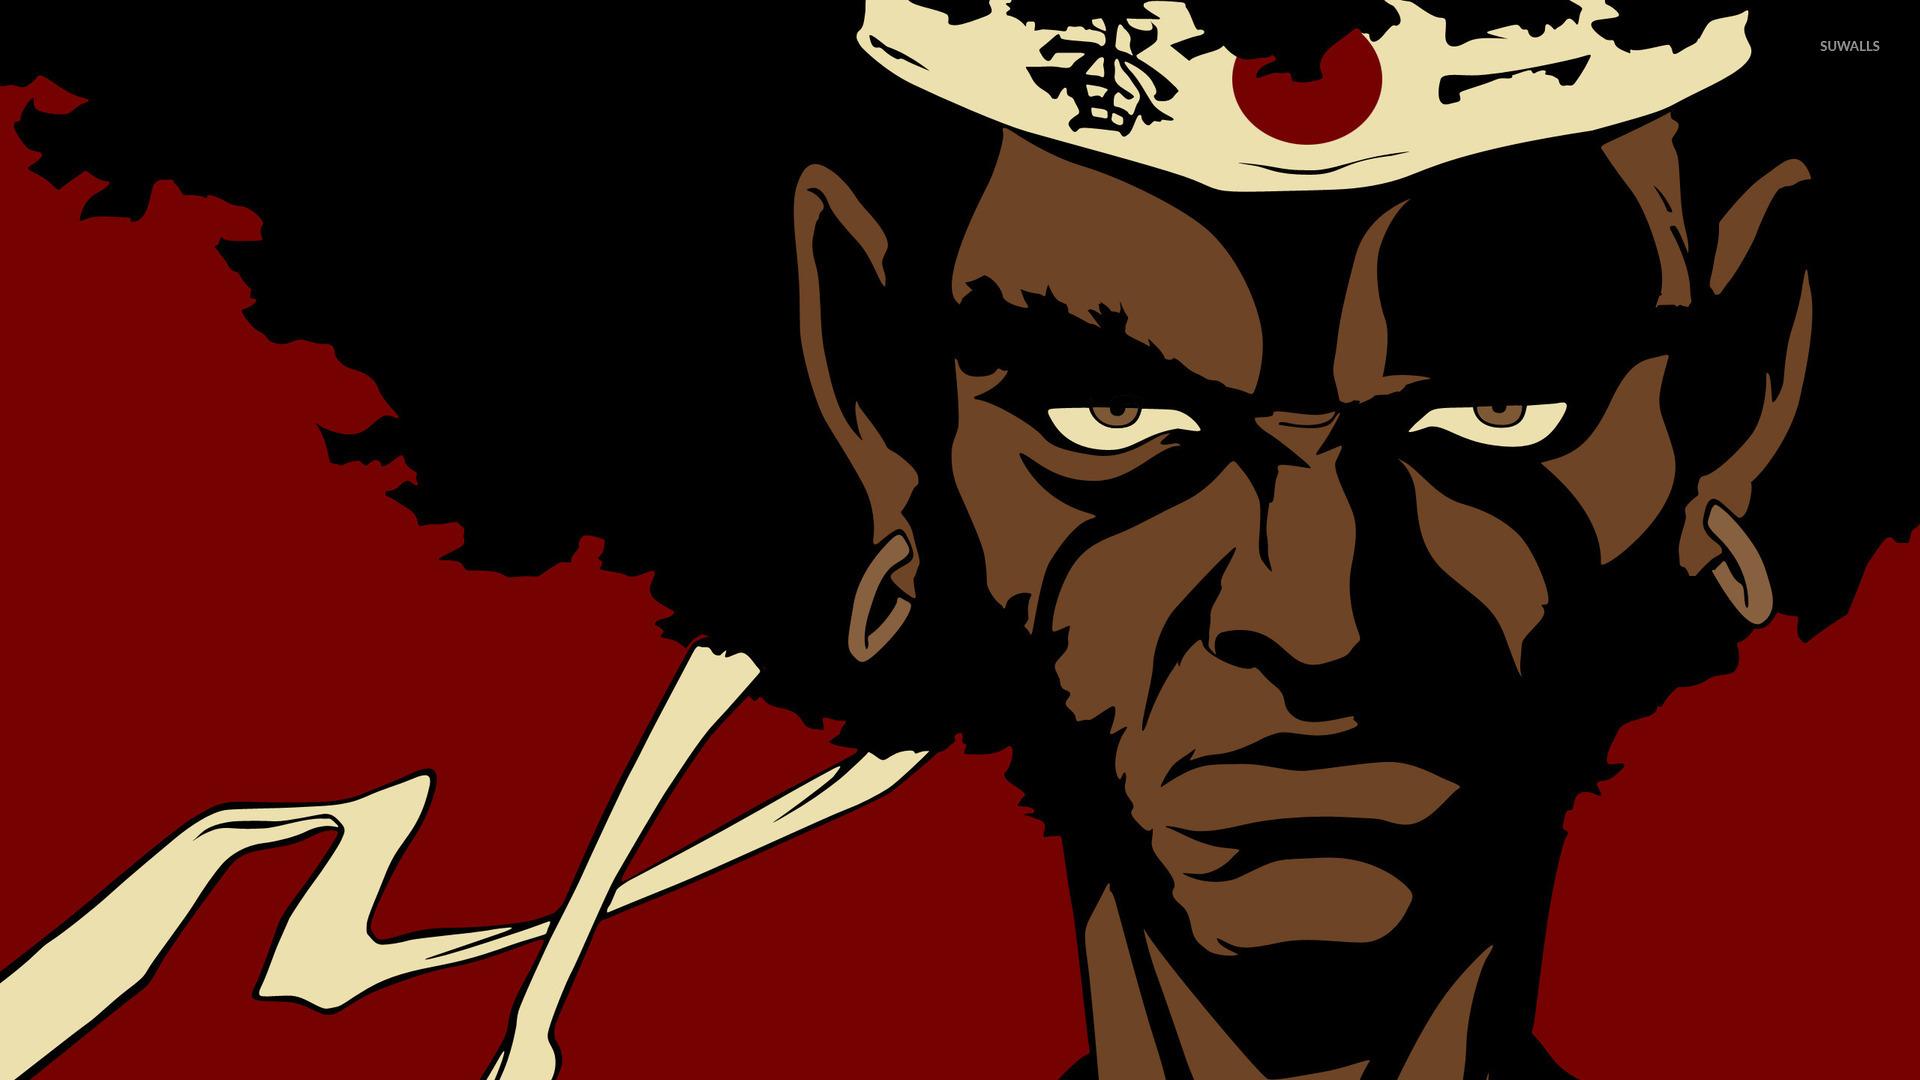 Afro Samurai [4] wallpaper - Anime wallpapers - #11535